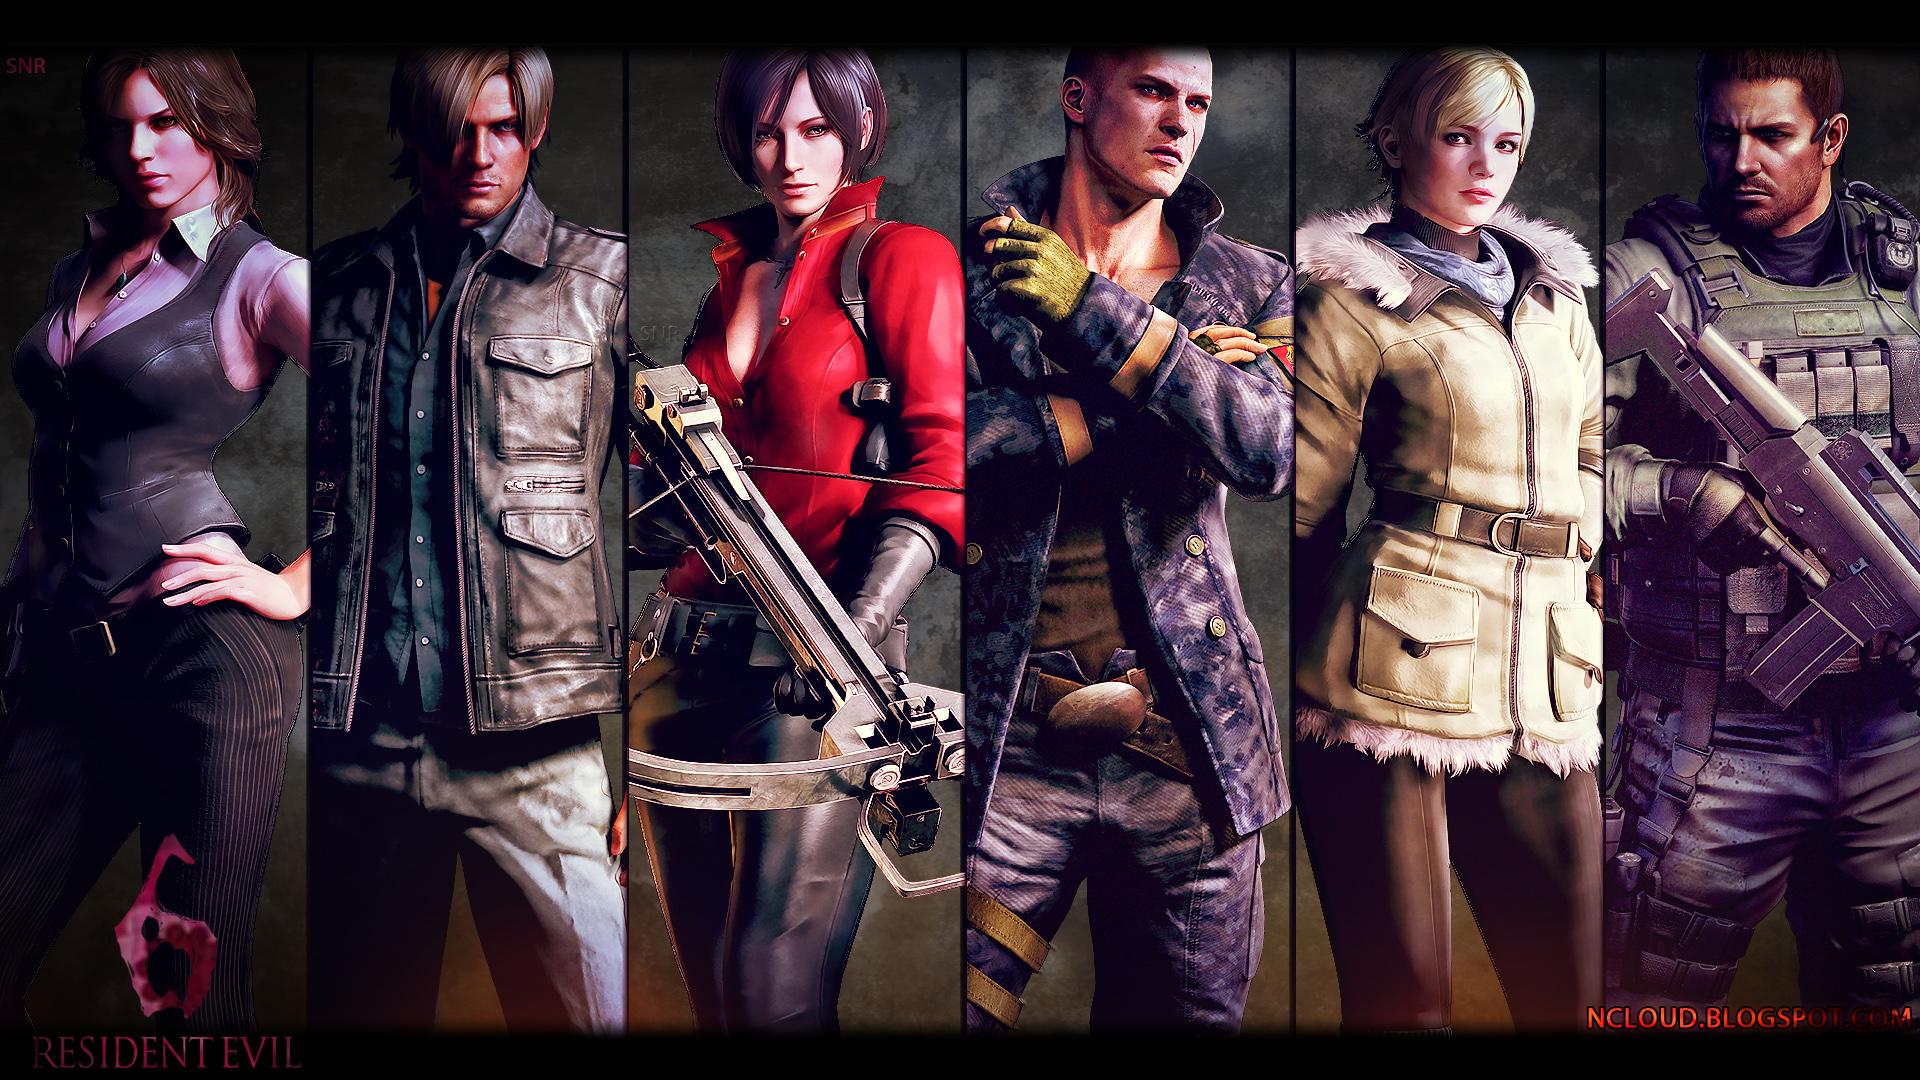 Wallpapers De Resident Evil 6 Alguno Te Llevas + Yapa